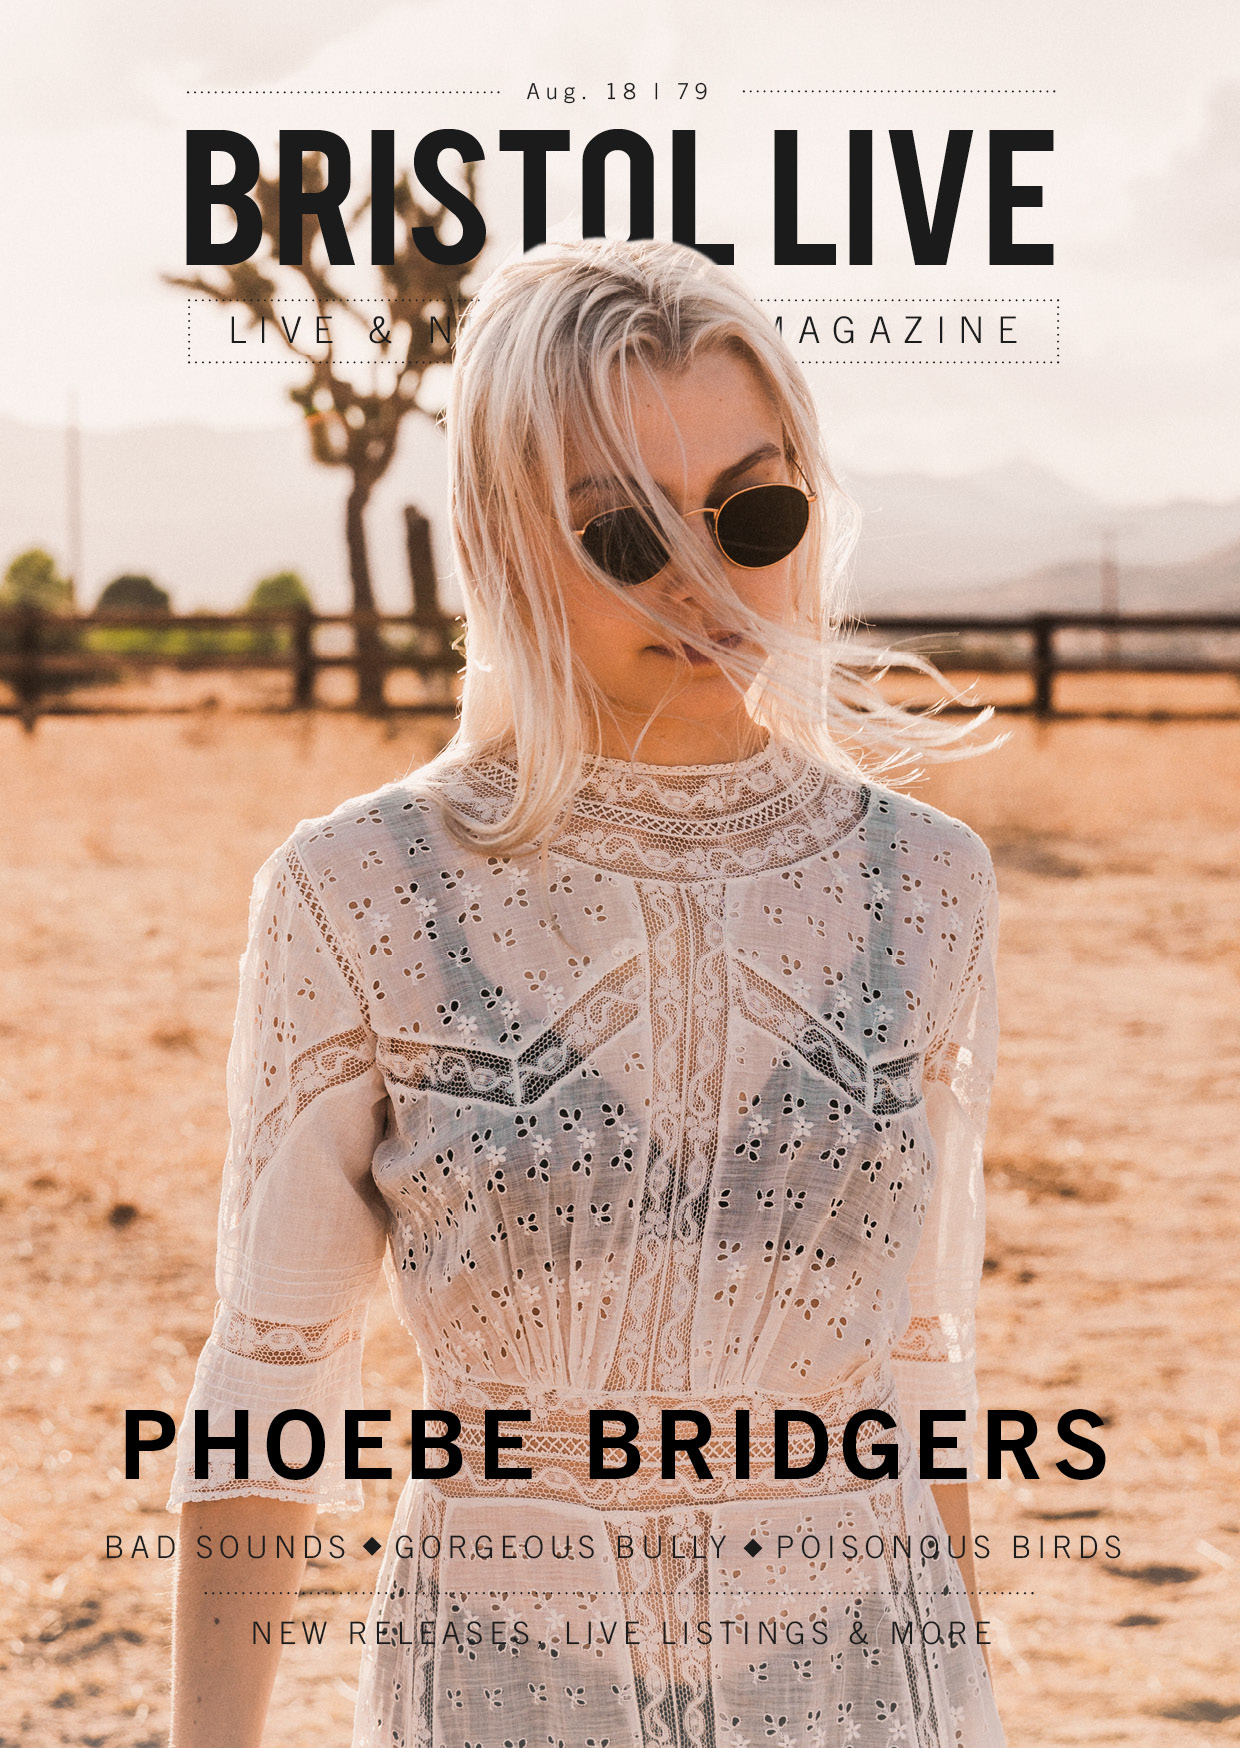 Phoebe Bridgers - Bristol Live magazine cover.jpg